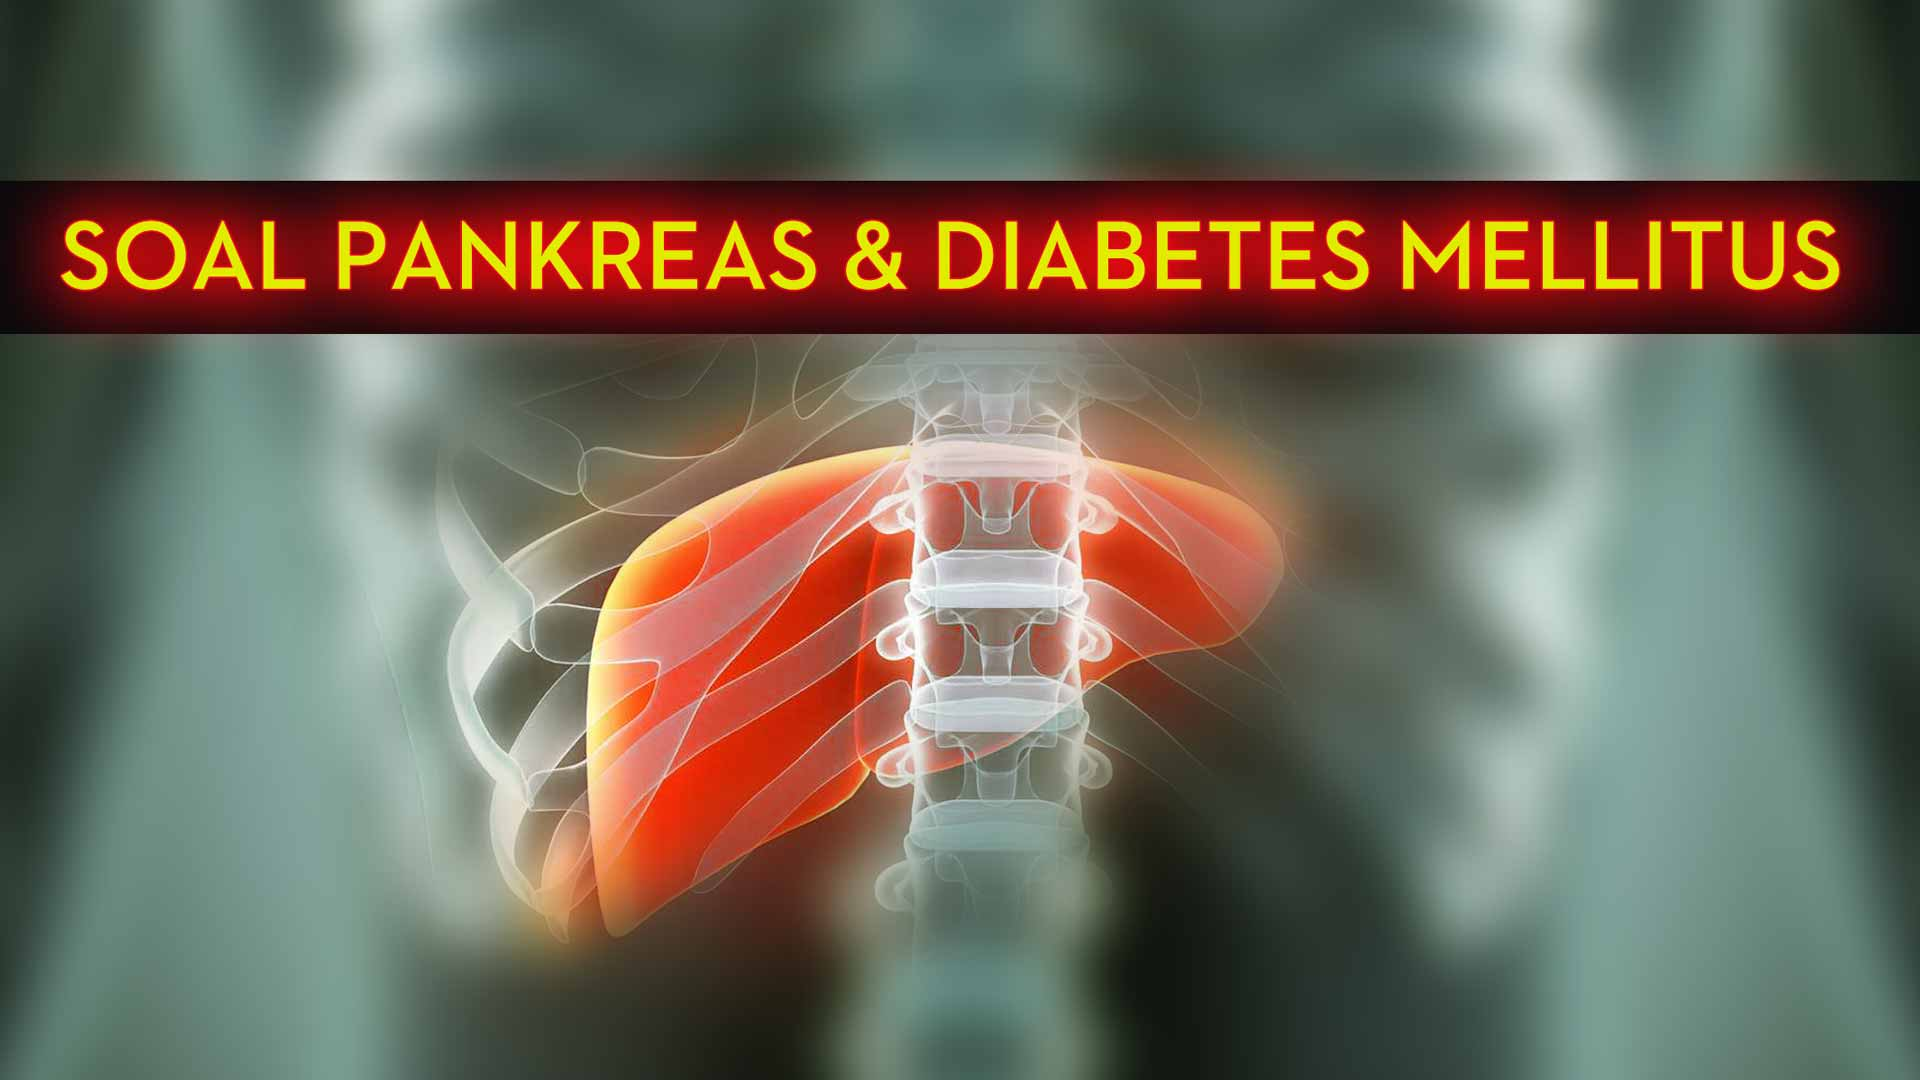 Soal-Pankreas-&-Diabetes-Mellitus